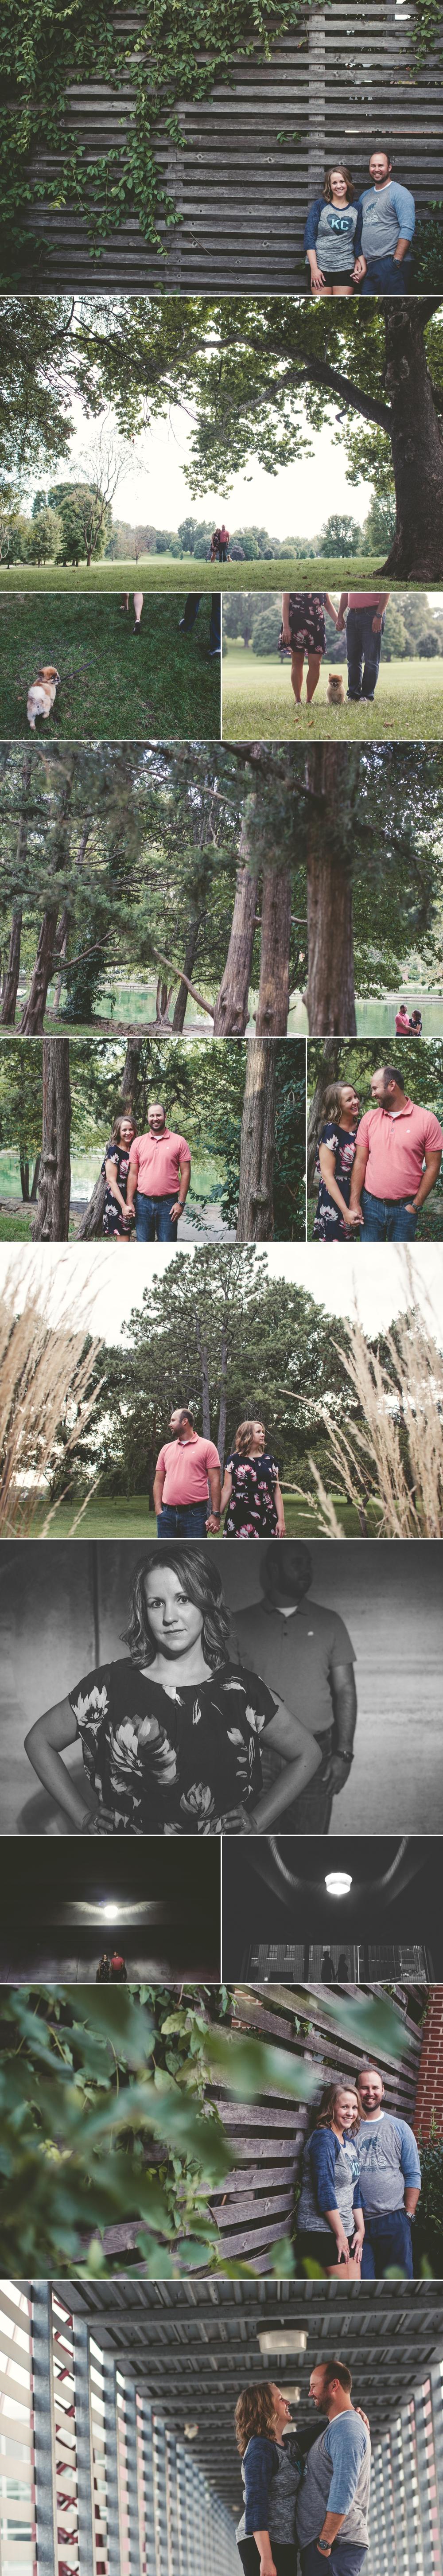 jason_domingues_photography_best_kansas_city_photographer_kc_wedding_engagement_loose_park_crossroads_royals_cubs_creative_documentary_portrait